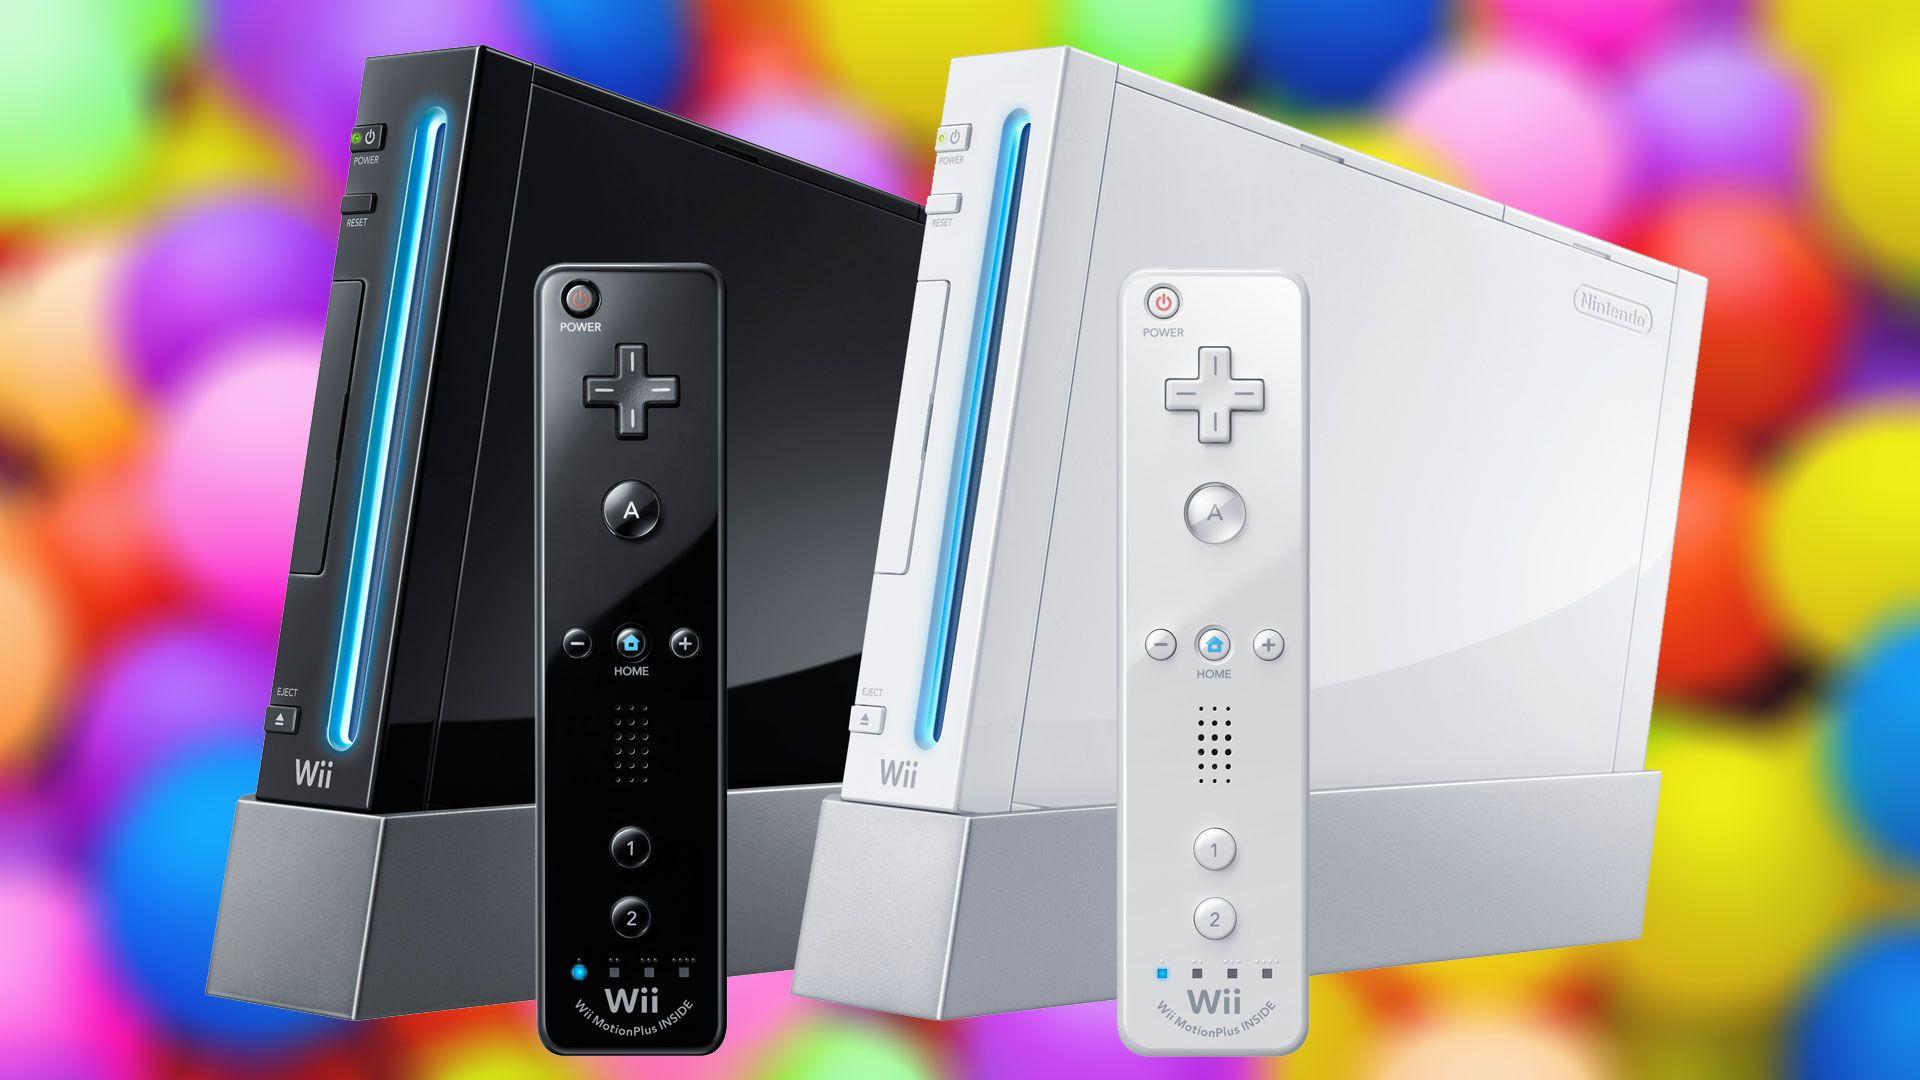 Burn Wii Games